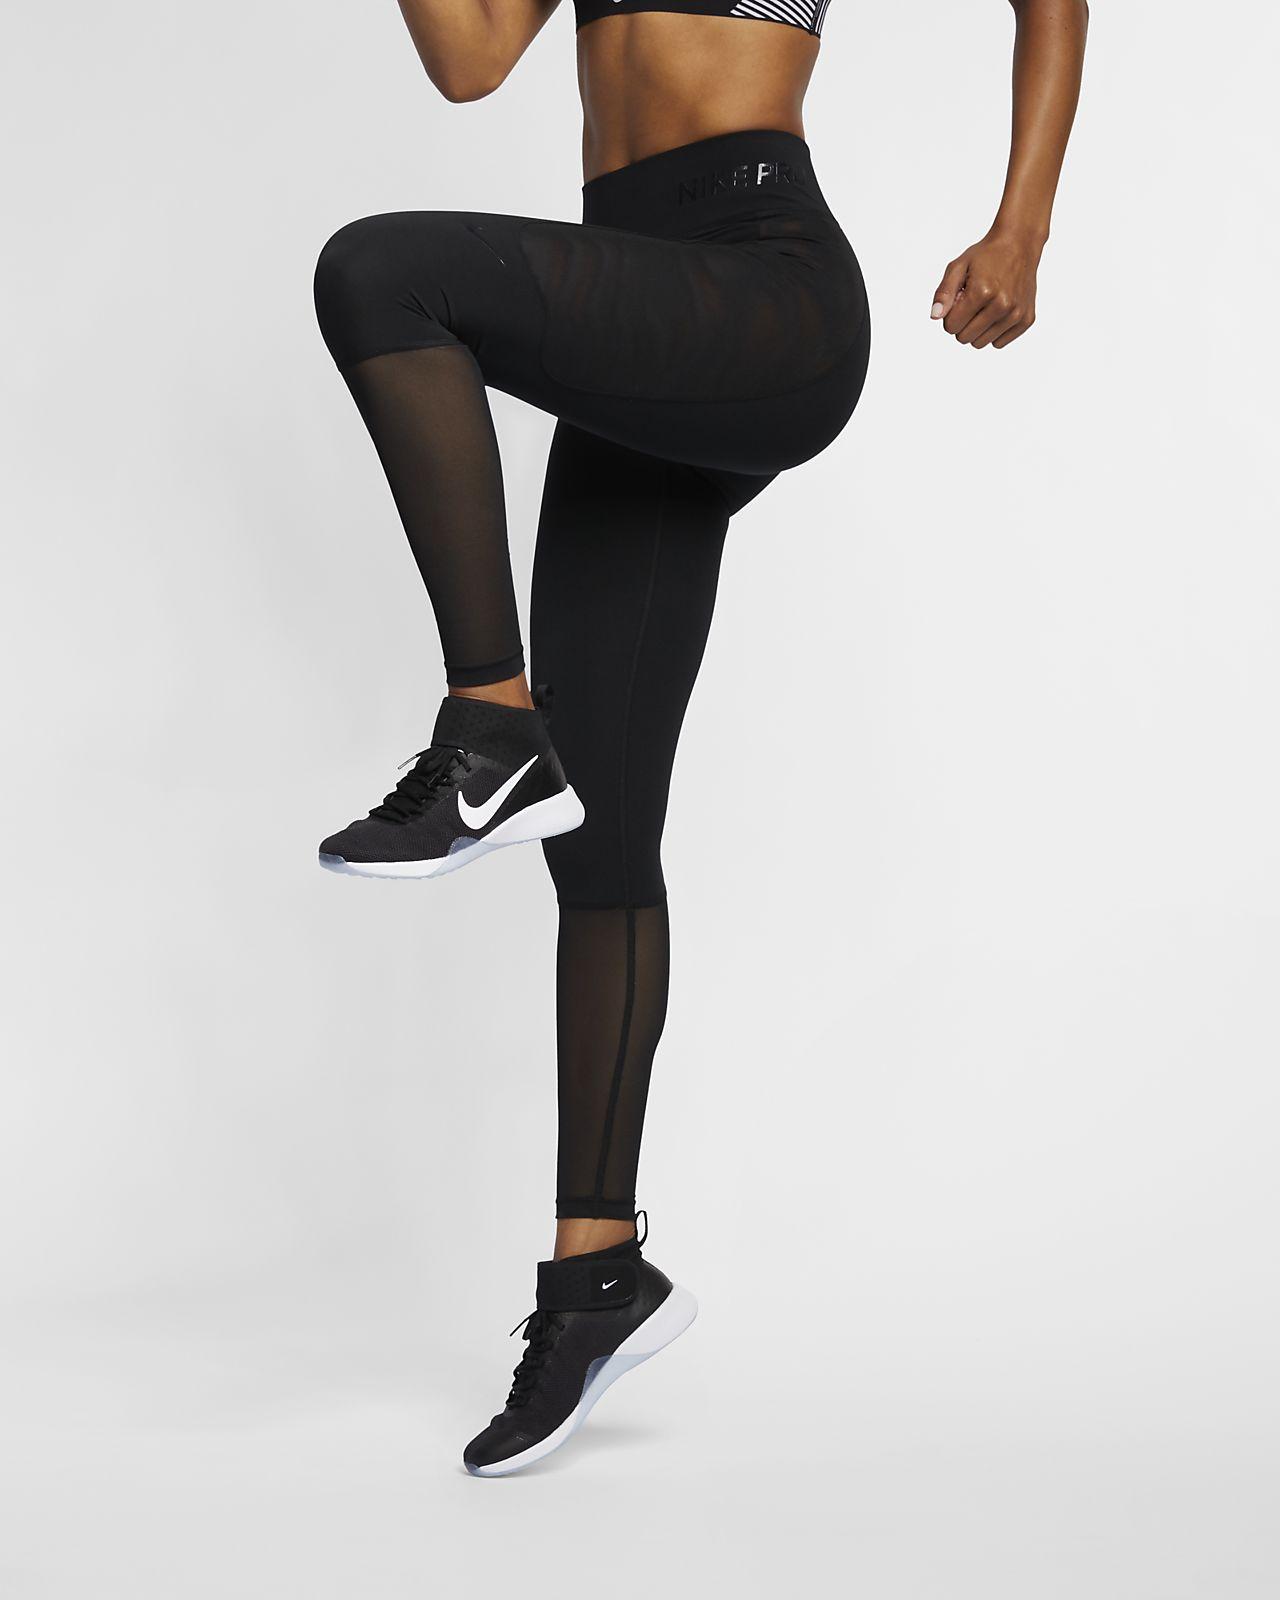 e52476e223 Low Resolution Nike Pro HyperCool Women's Tights Nike Pro HyperCool Women's  Tights